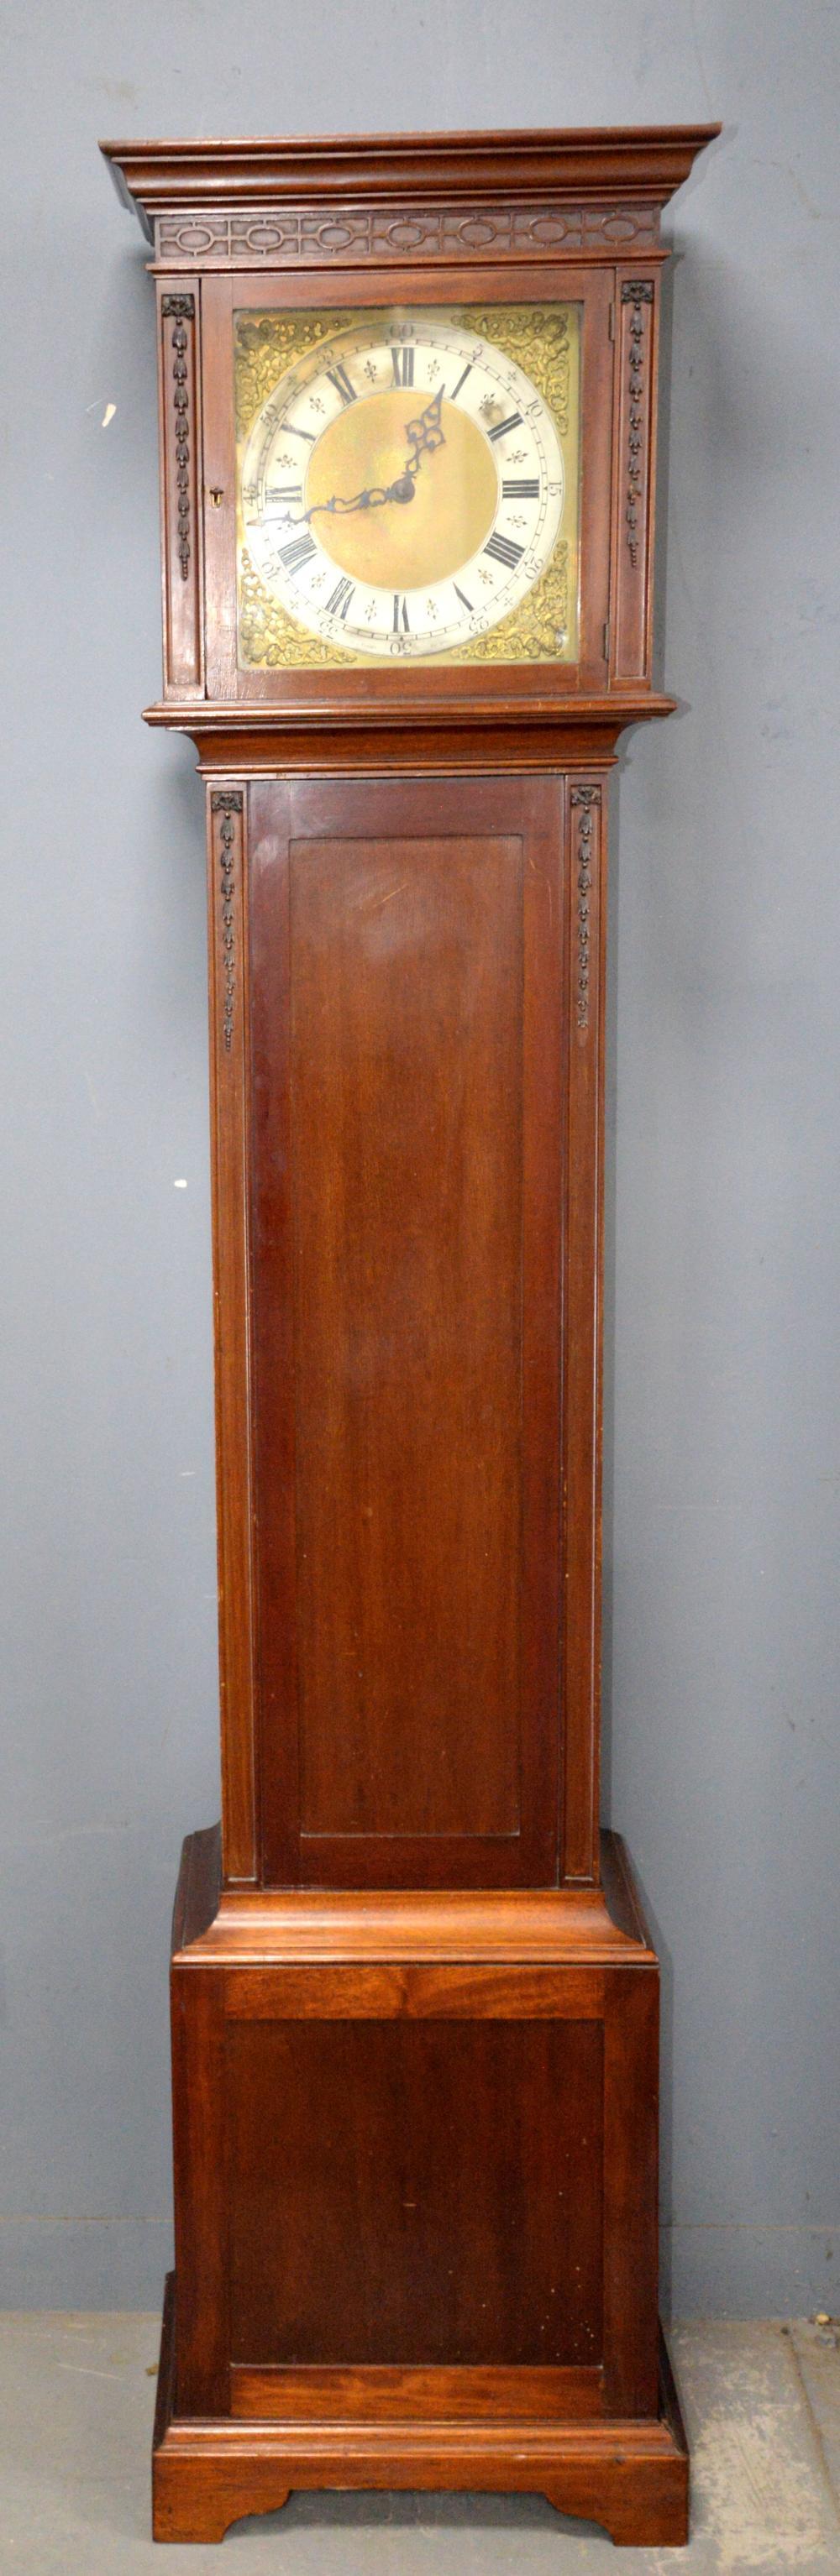 1920's mahogany eight day long case clock by A J F